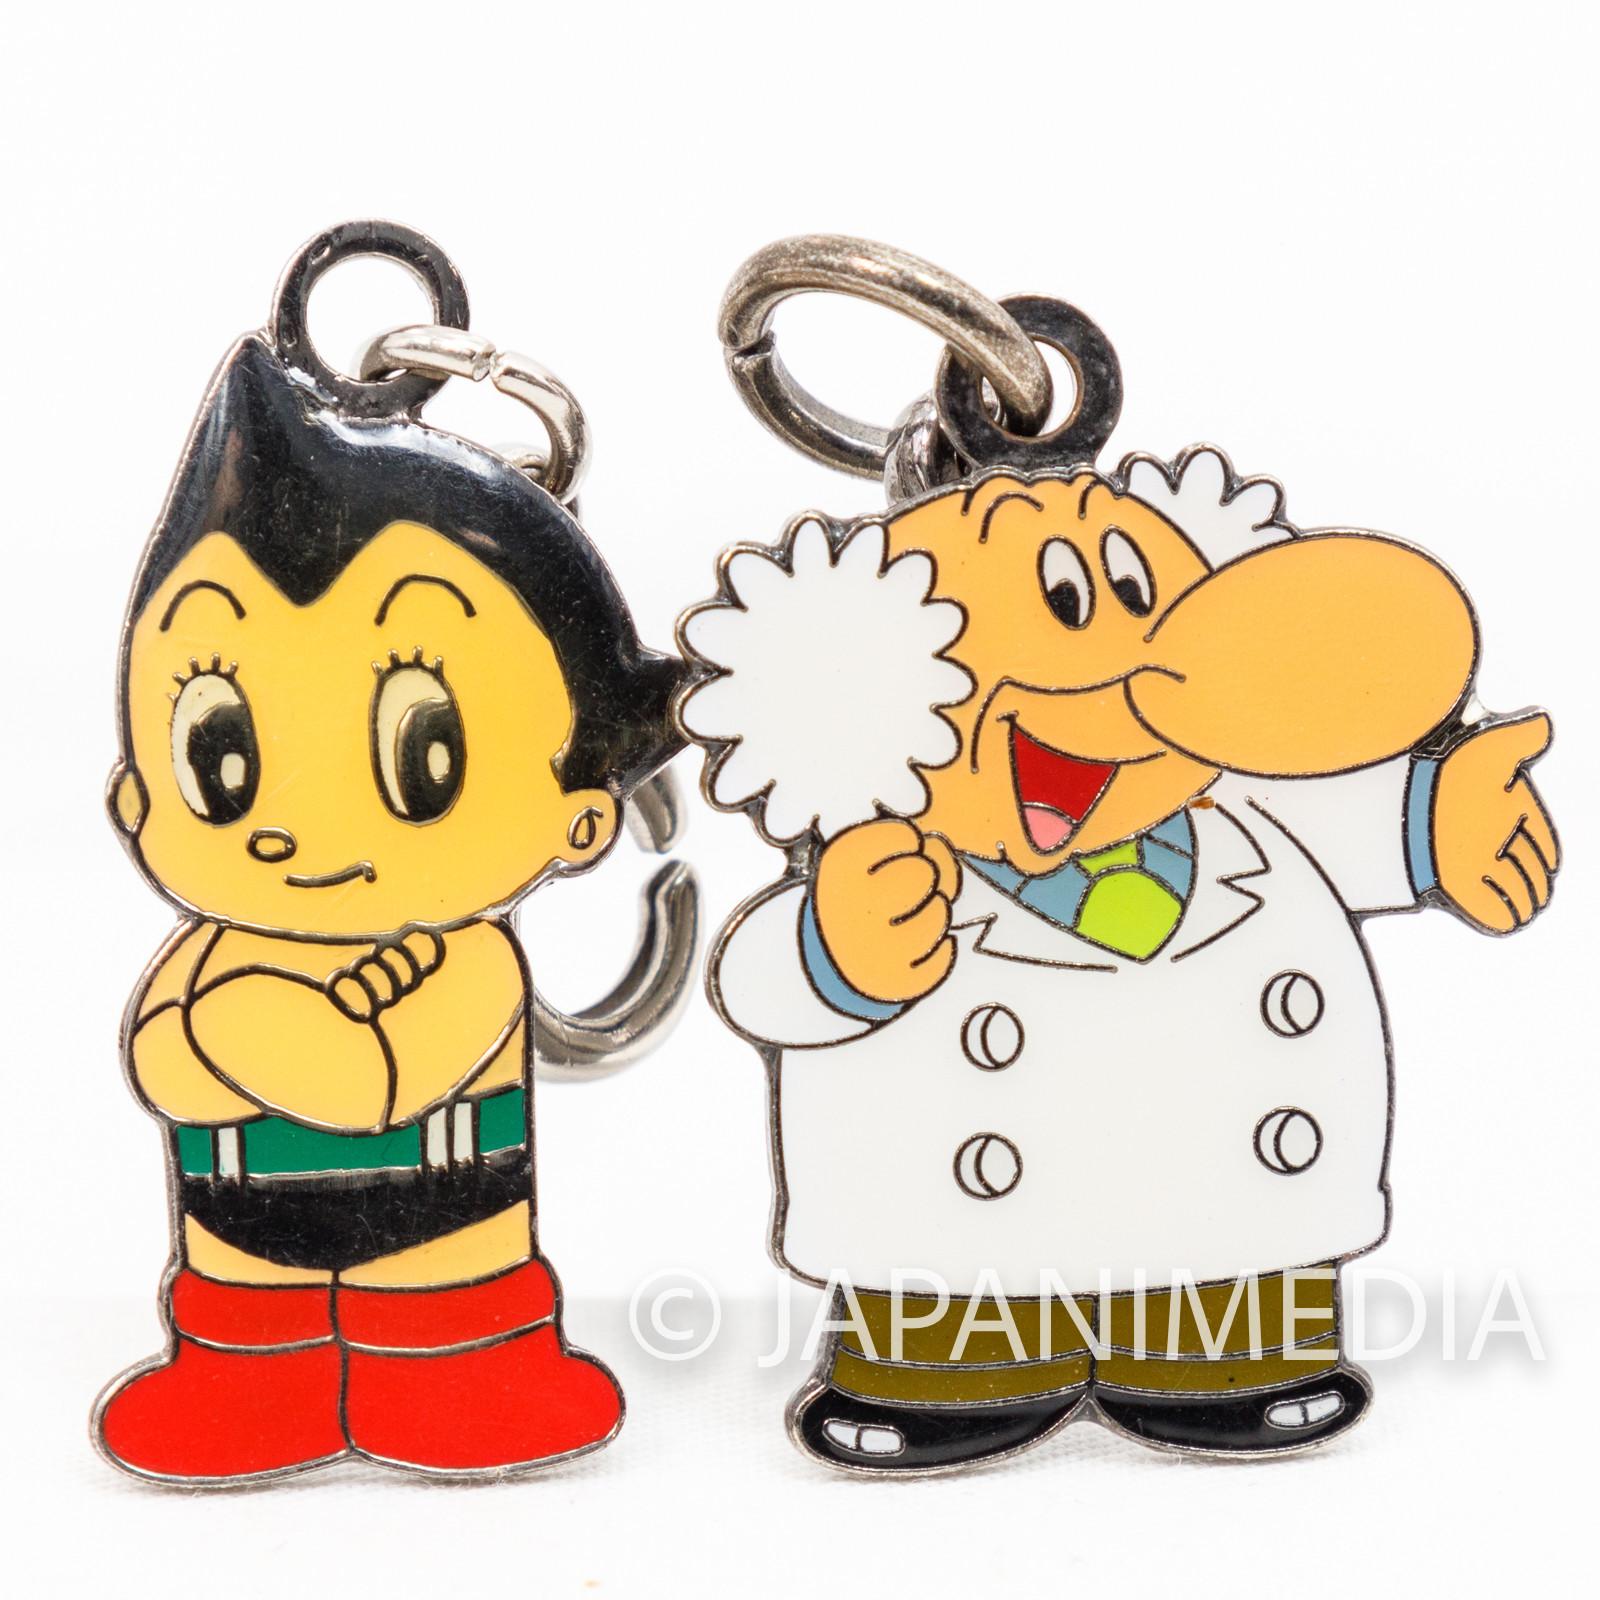 Astro Boy Atom Metal Charm Set Atom & Ochanomizu JAPAN